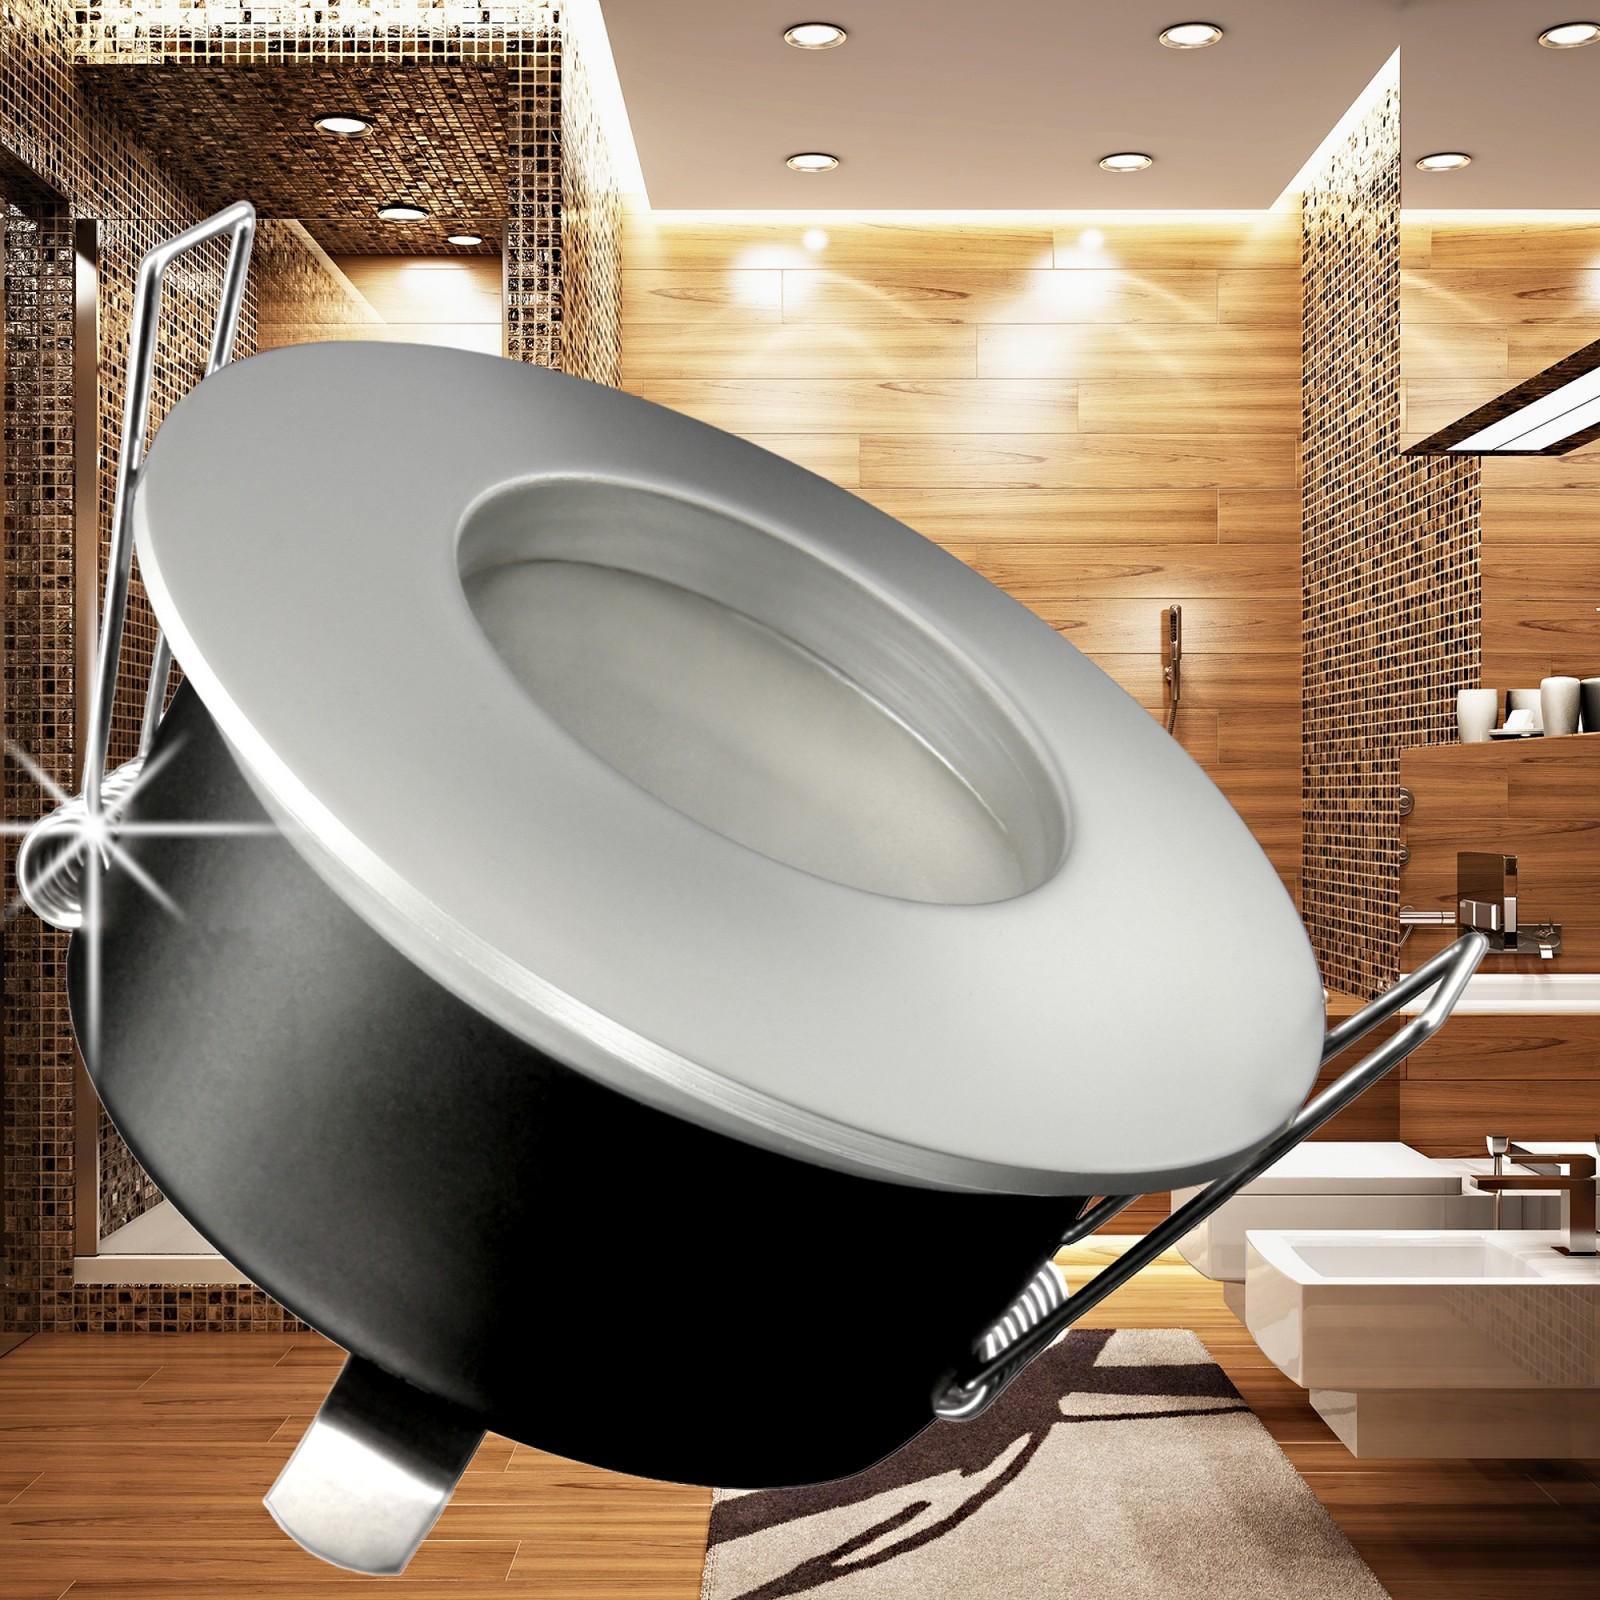 rw 1 led einbaustrahler feuchtraum ip65 54 leds ww gu10 ebay. Black Bedroom Furniture Sets. Home Design Ideas